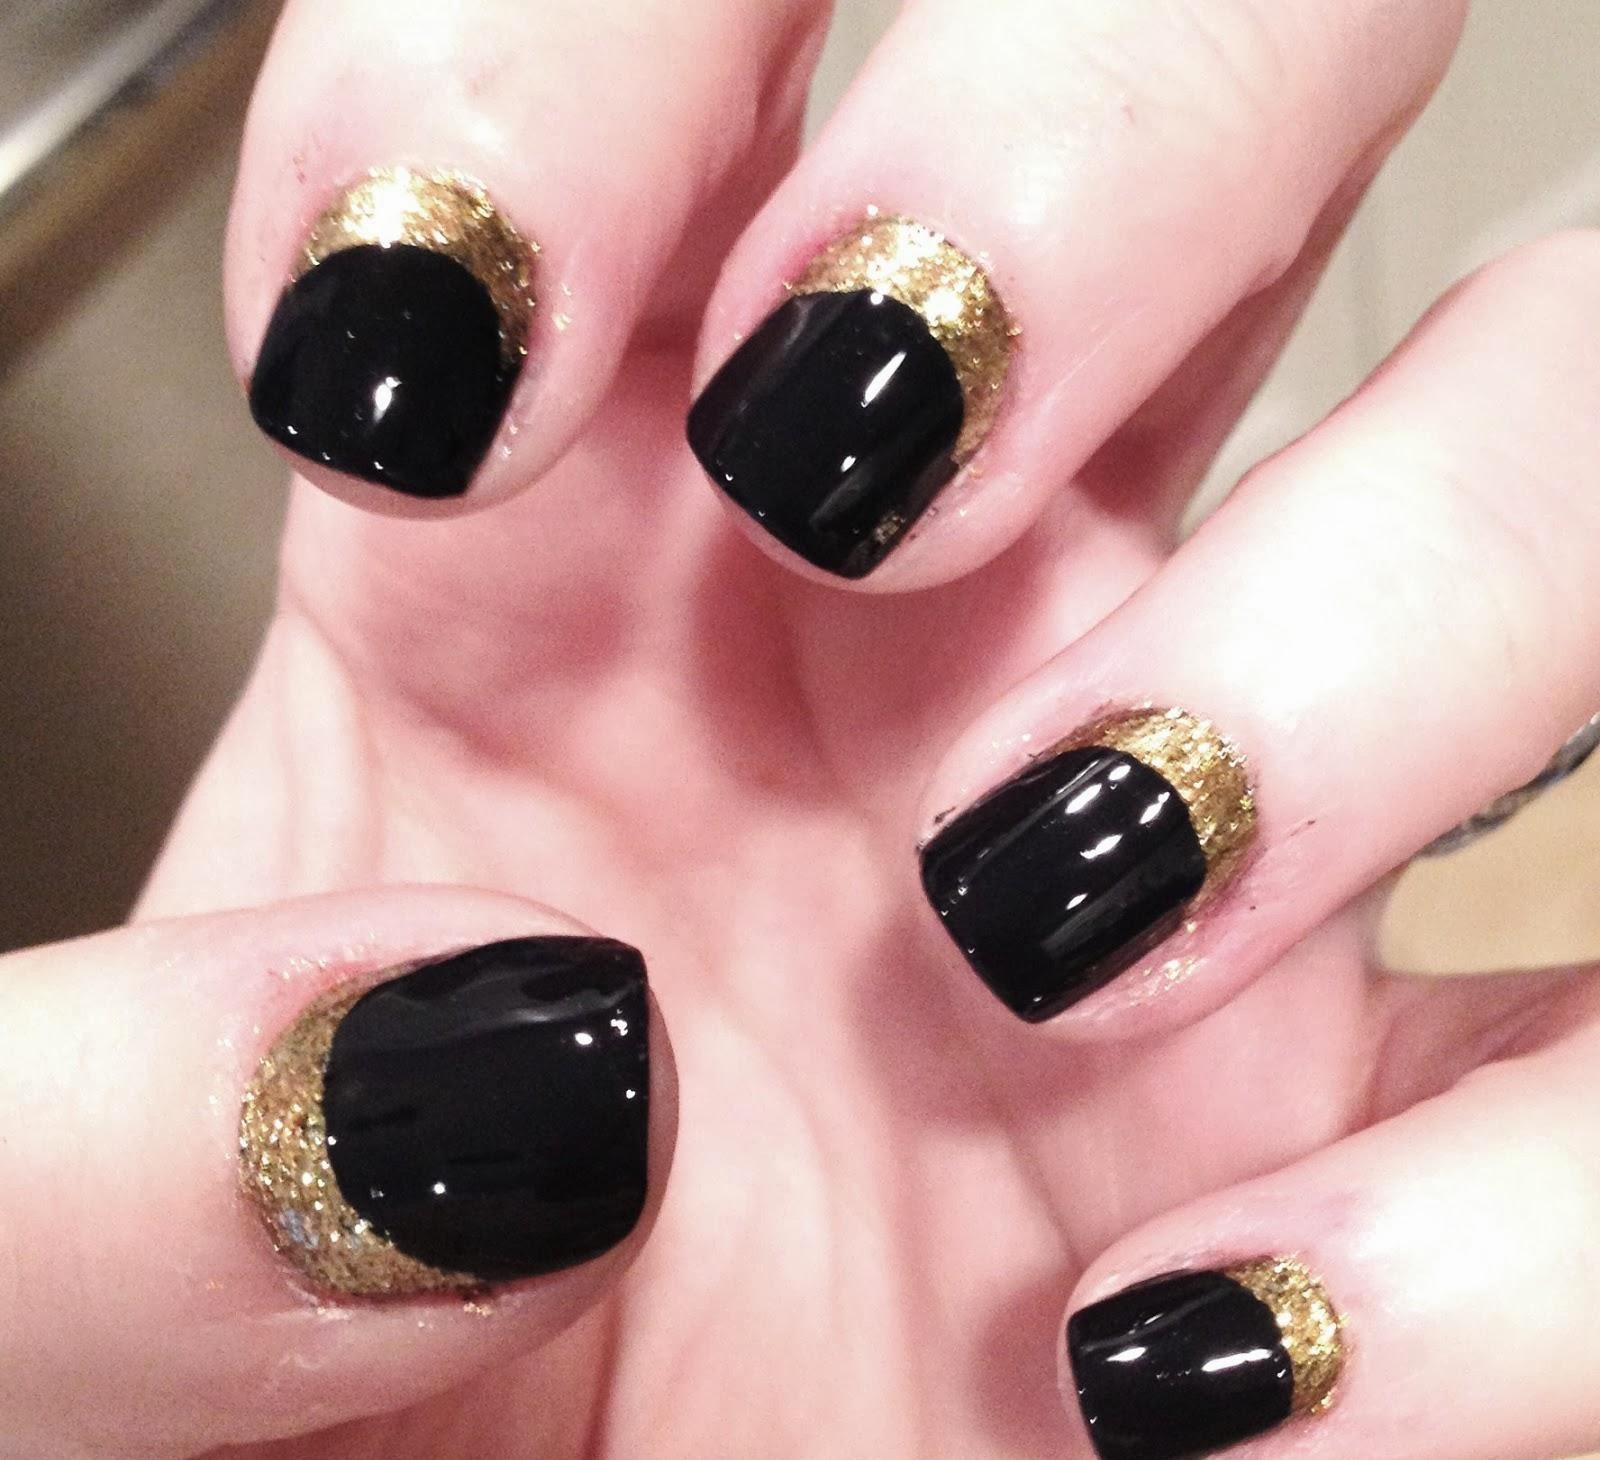 Free download hd wallpapers nail art designs hd wallpapers - Nails wallpaper download ...